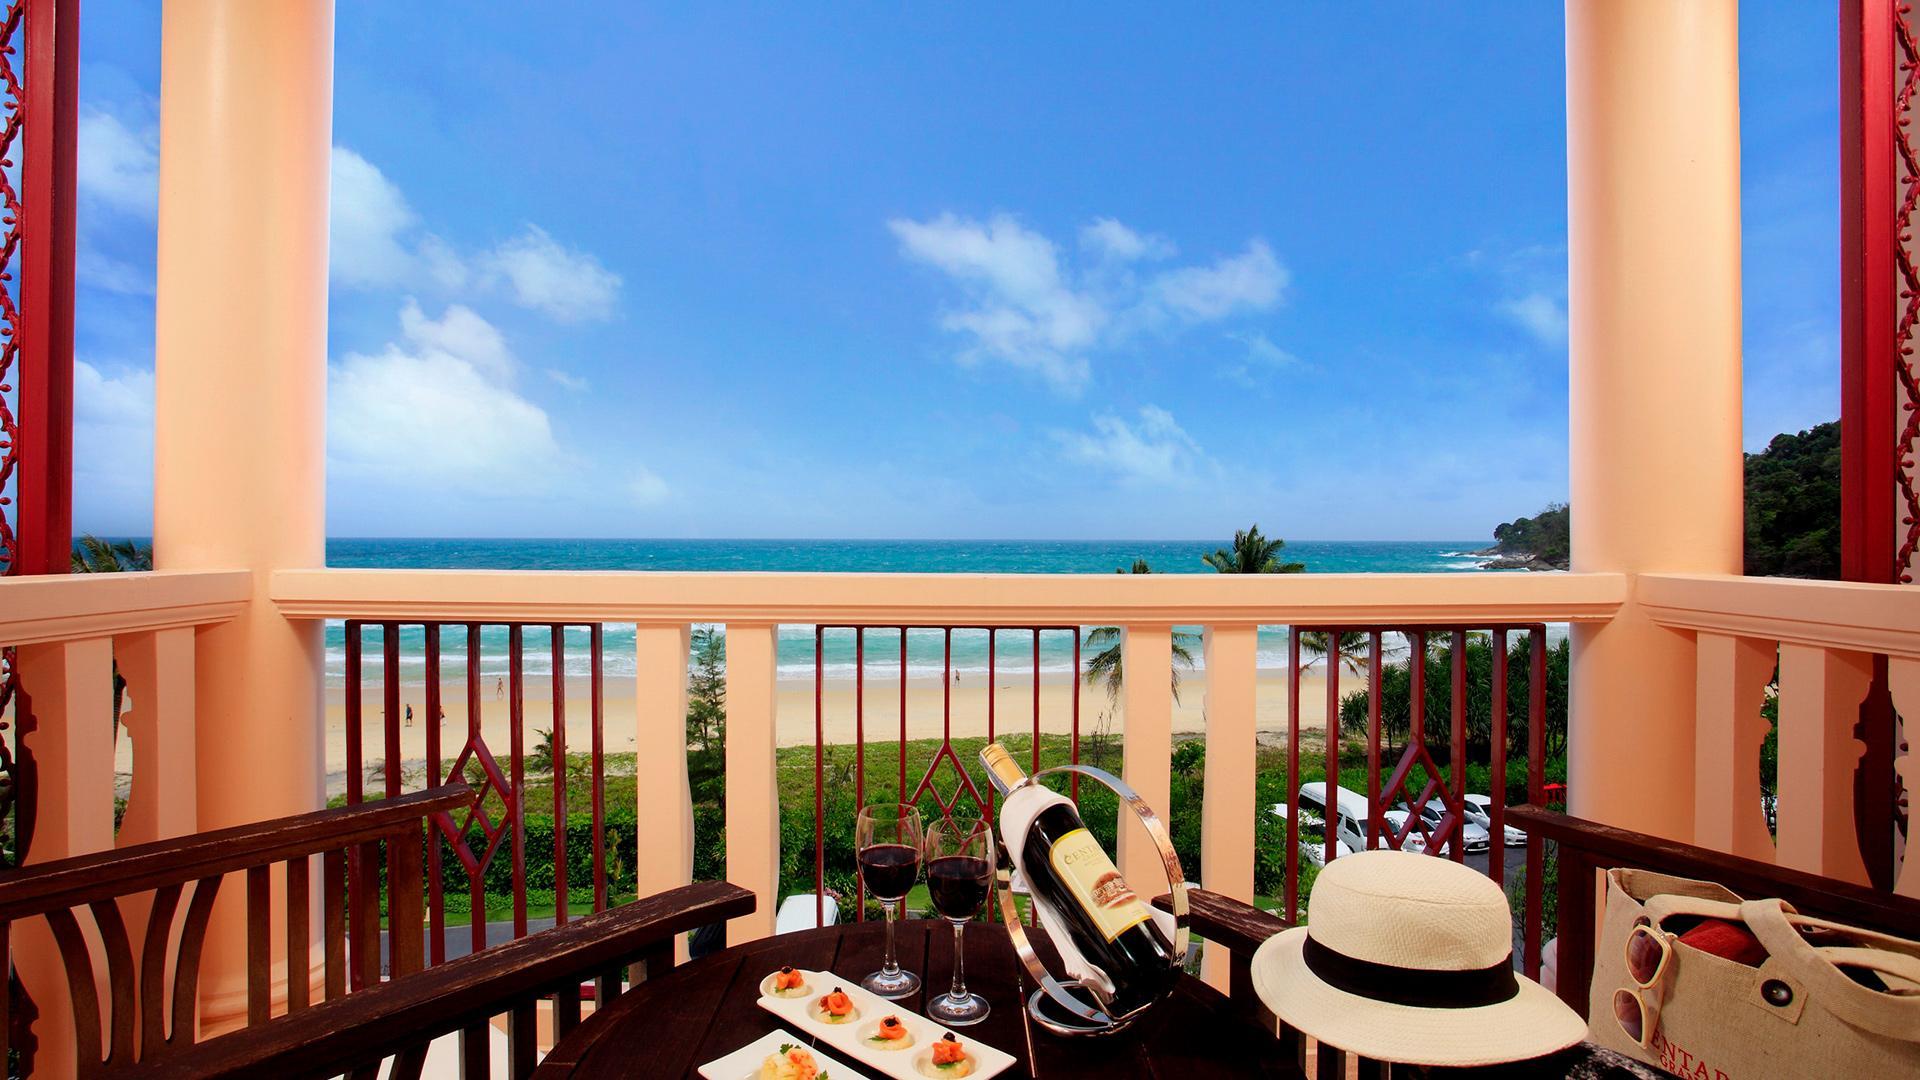 Deluxe Sea View Room image 1 at Centara Grand Beach Resort Phuket by อำเภอเมืองภูเก็ต, Phuket, Thailand